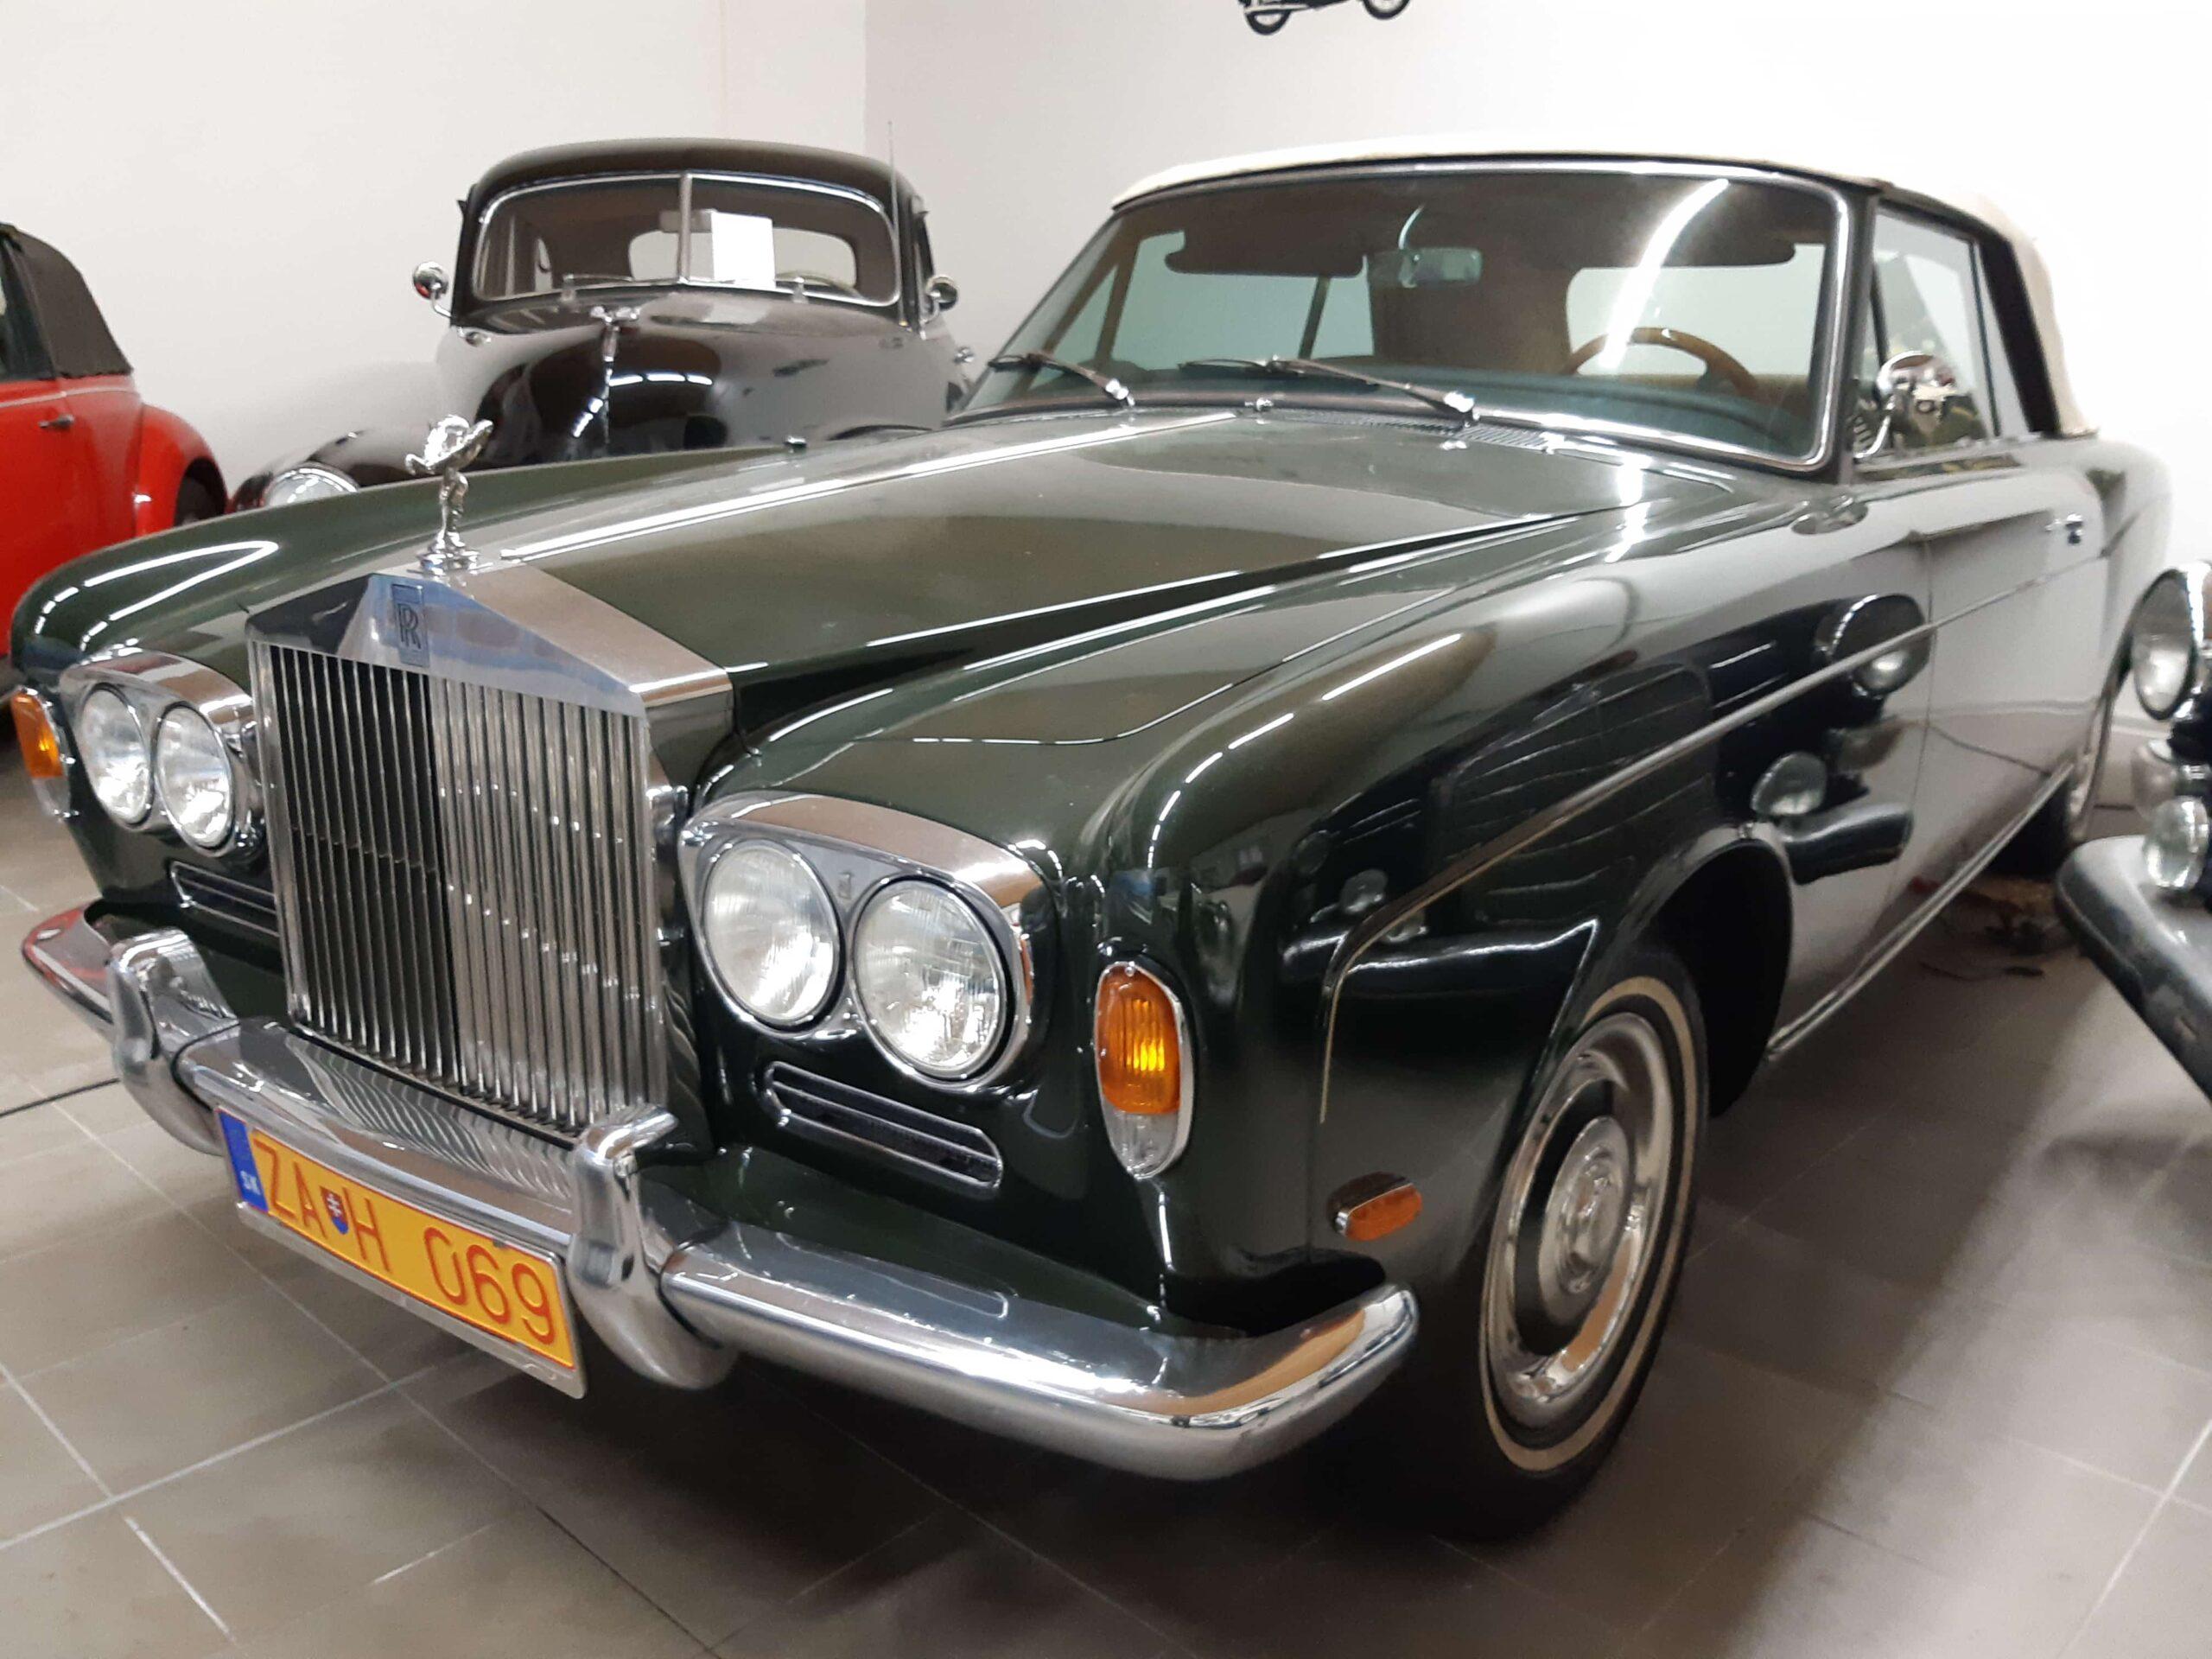 1968 Rolls-Royce Silver Shadow Convertible